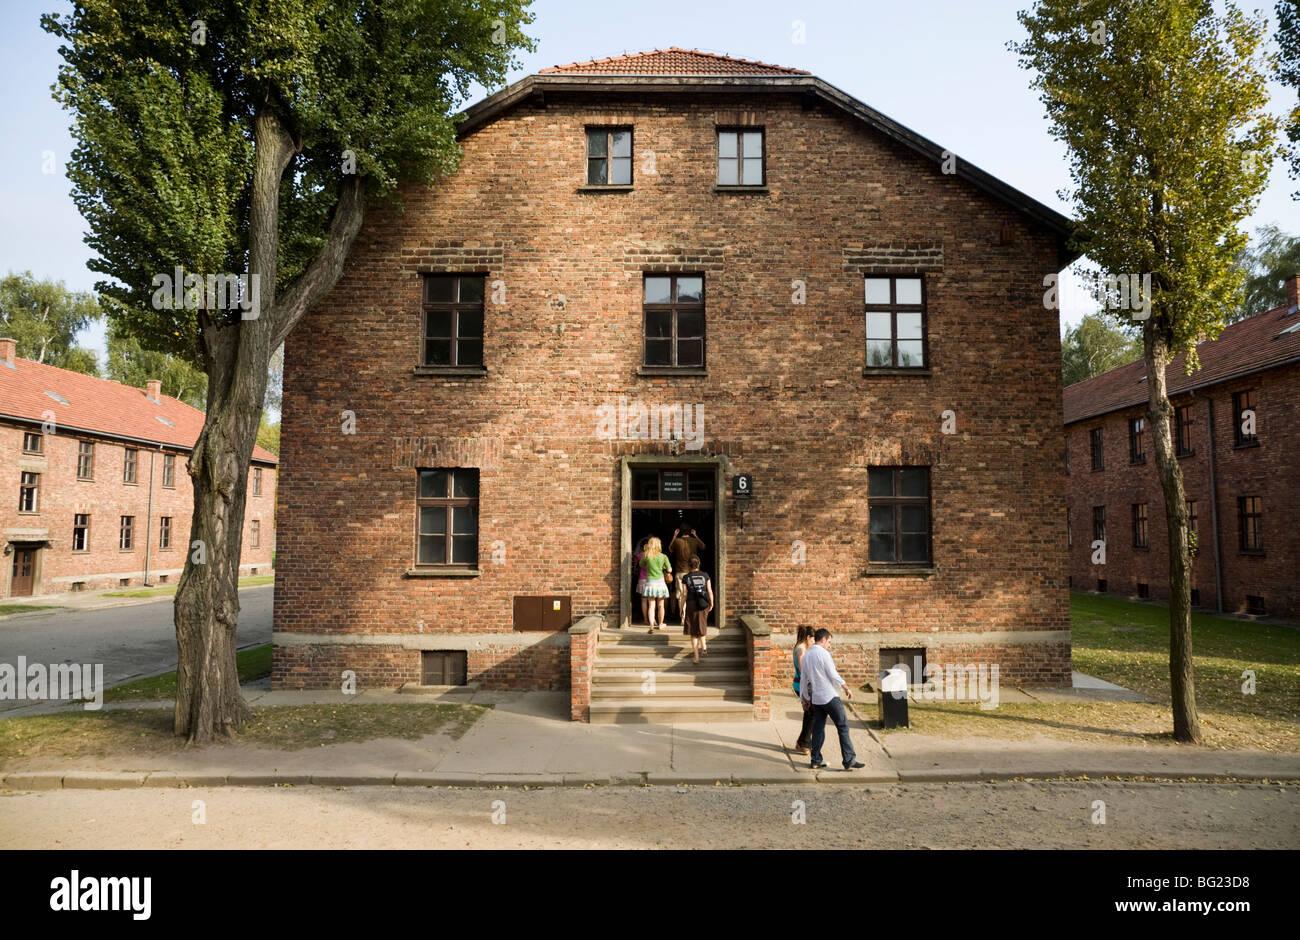 Prisoner accommodation block at the Auschwitz Nazi death camp in Oswiecim, Poland. - Stock Image